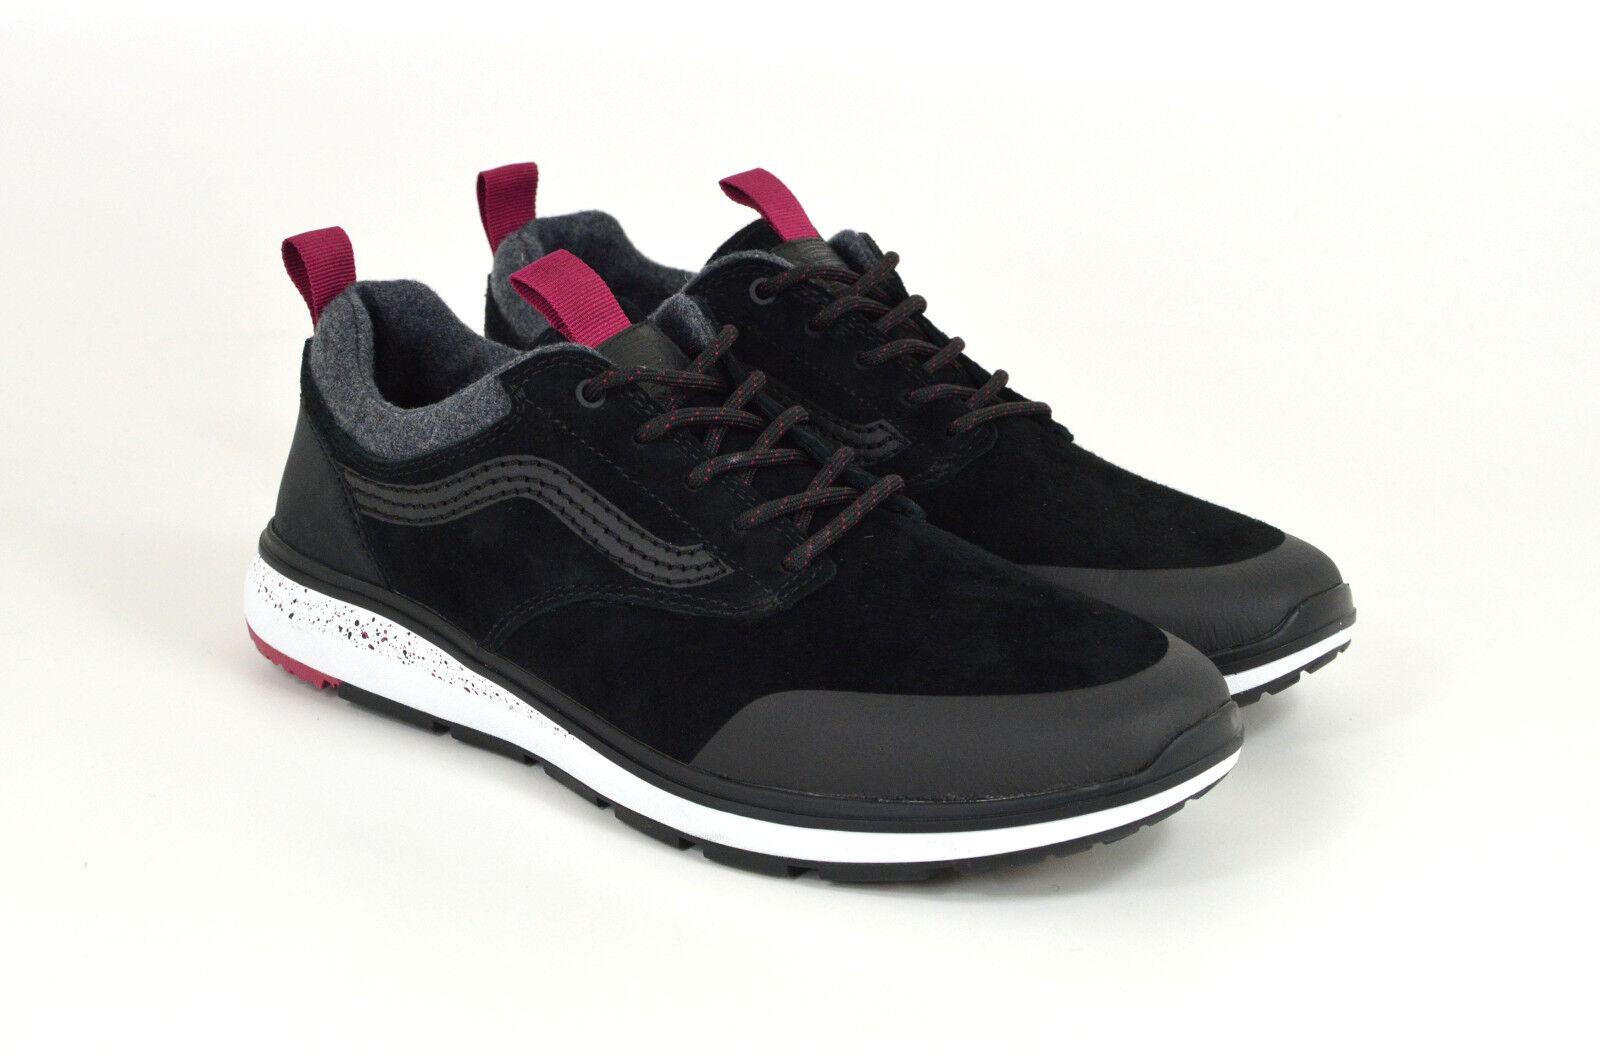 Vans, Iso 3 MTE, Sneaker, schwarz/Beet ROT, Schwarz/Grau/Rot, Veloursleder, Neu